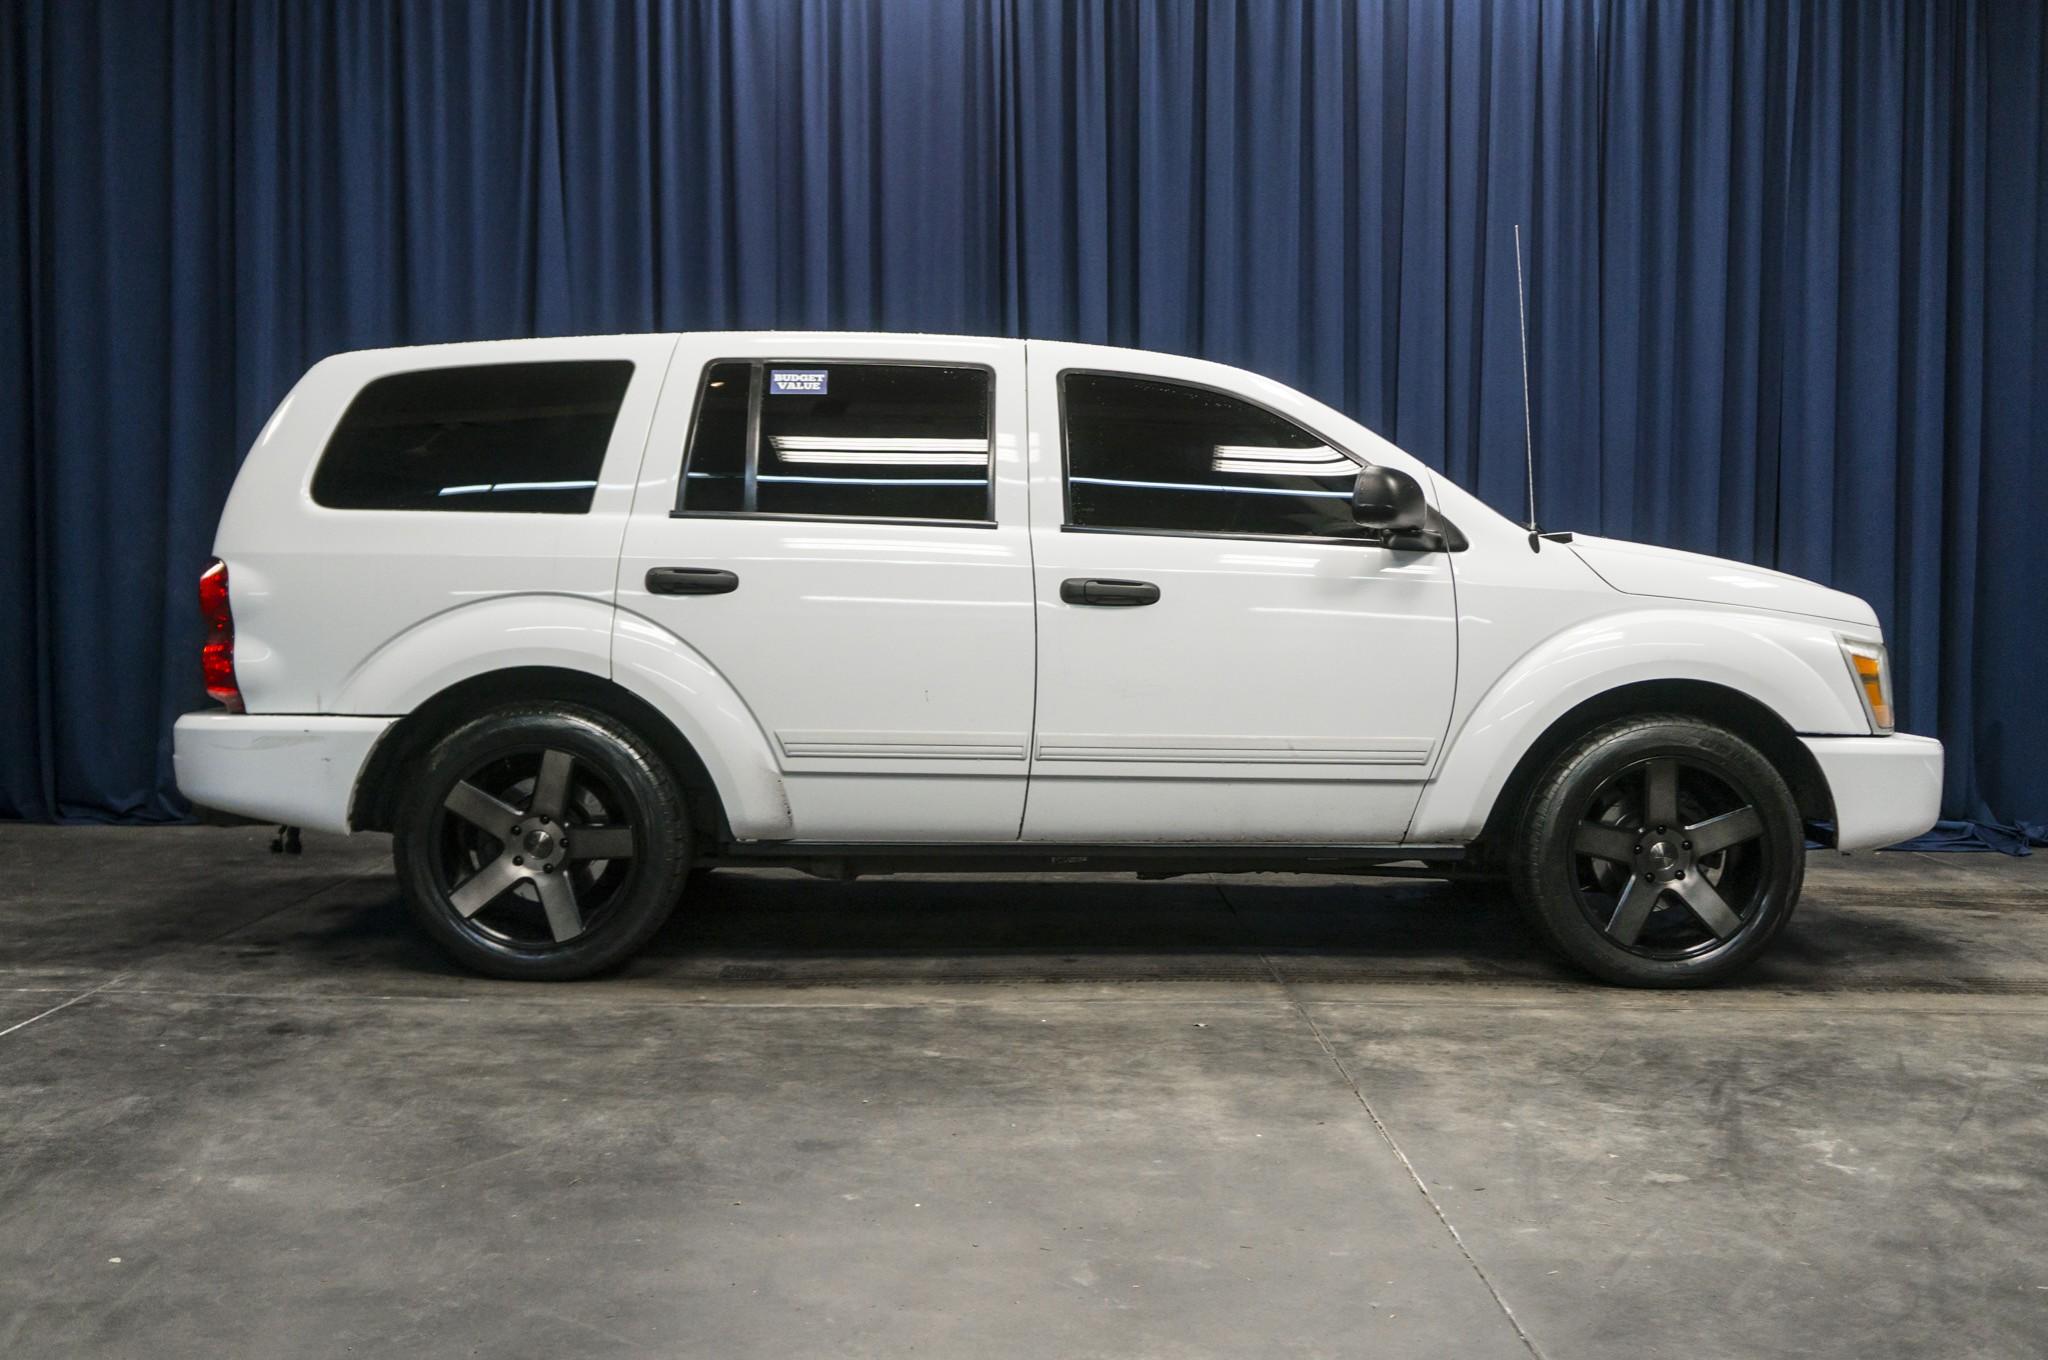 Used 2004 Dodge Durango SLT 4x4 SUV For Sale - 34483A